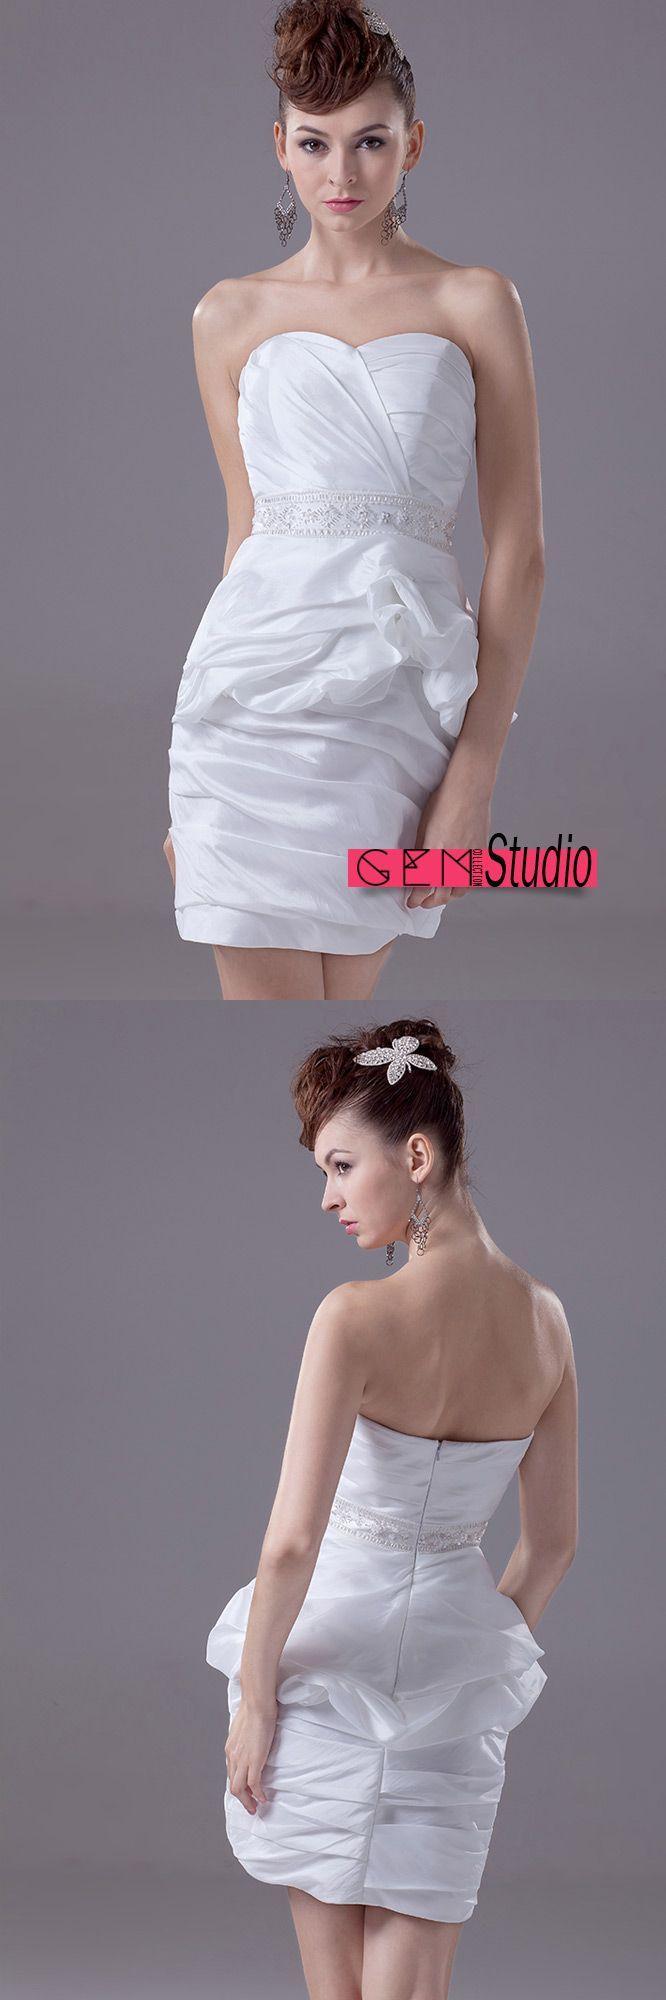 Chic short wedding dresses reception little plain white taffeta